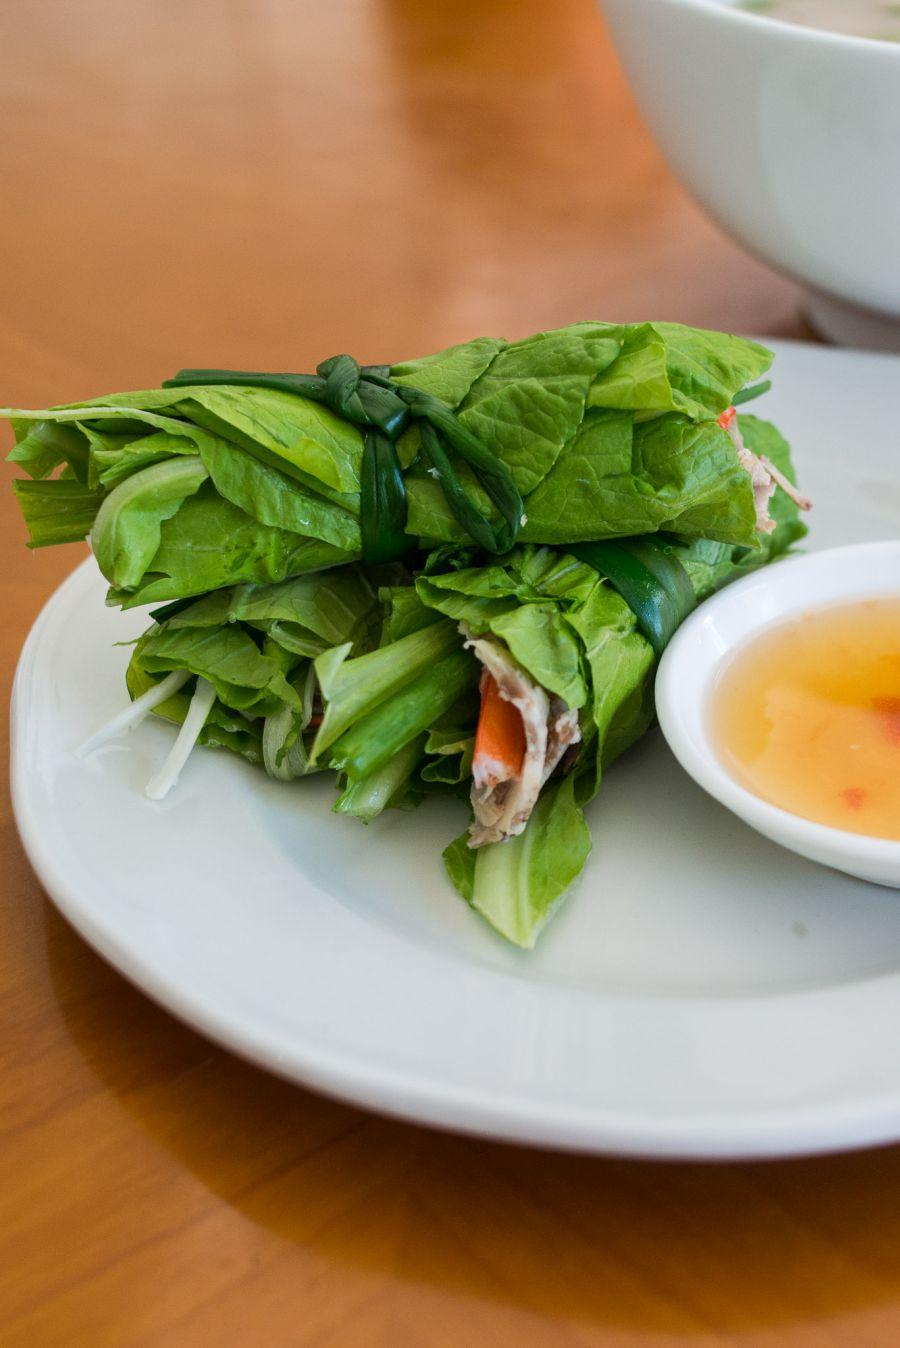 Goi Cuon U&I - prawn and pork with salad wrapped in green leaves (AU$6.50)